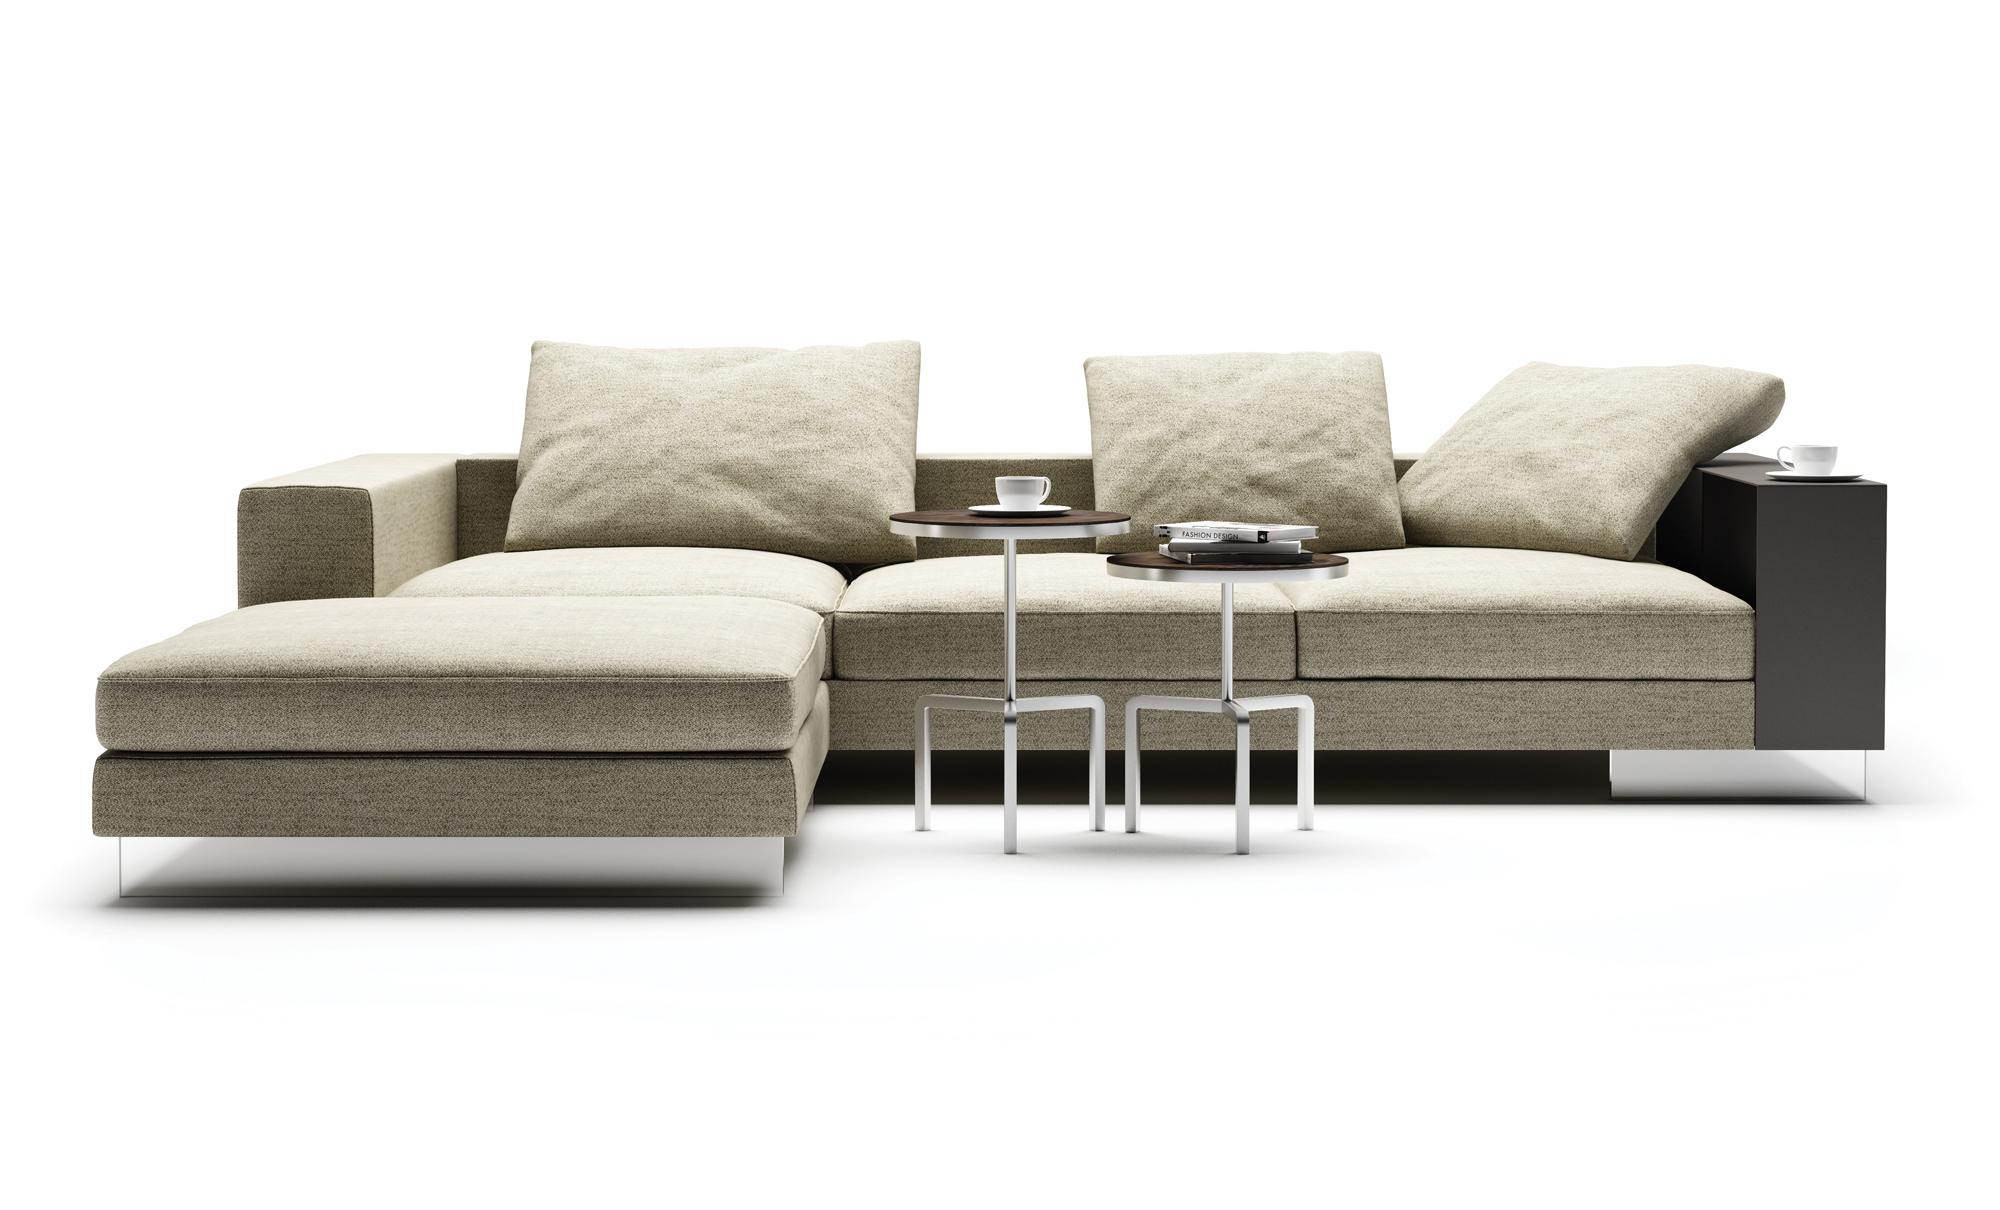 lightpiece modular sofa by flexform fanuli furniture. Black Bedroom Furniture Sets. Home Design Ideas